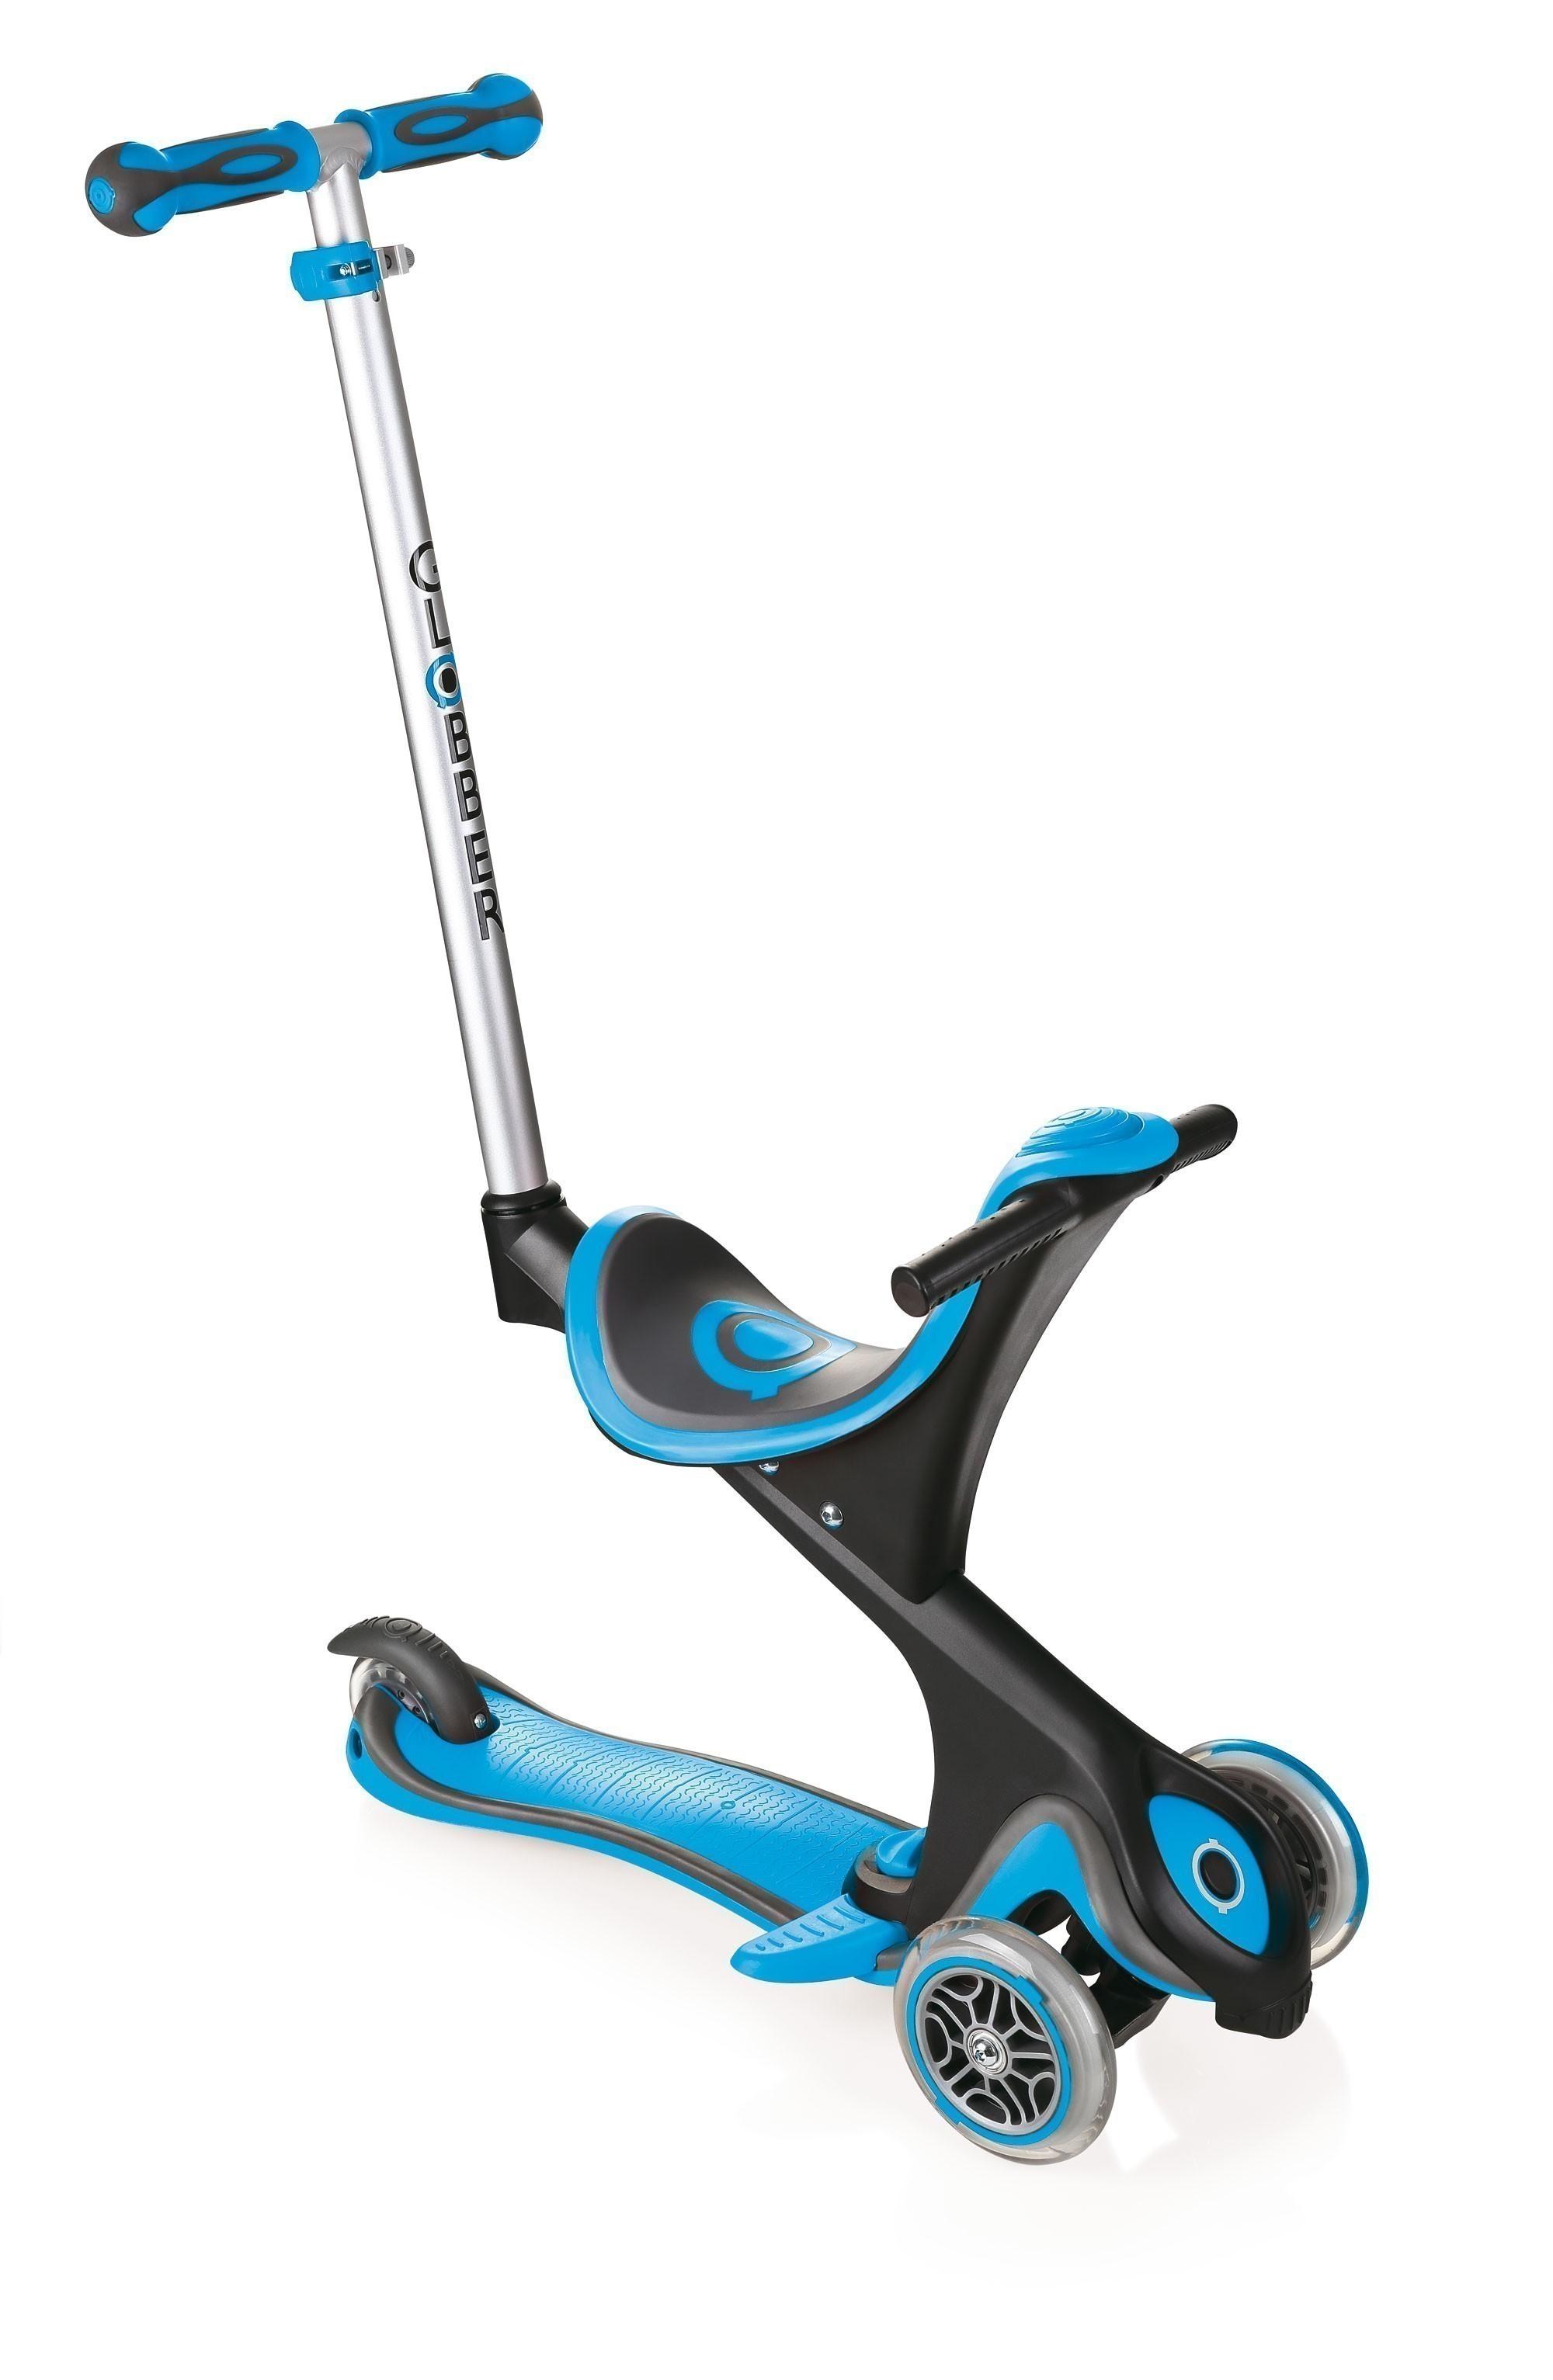 Scooter Kinderroller Dreirad Laufrad Globber Evo Comfort 5in1 himmelbl Bild 1